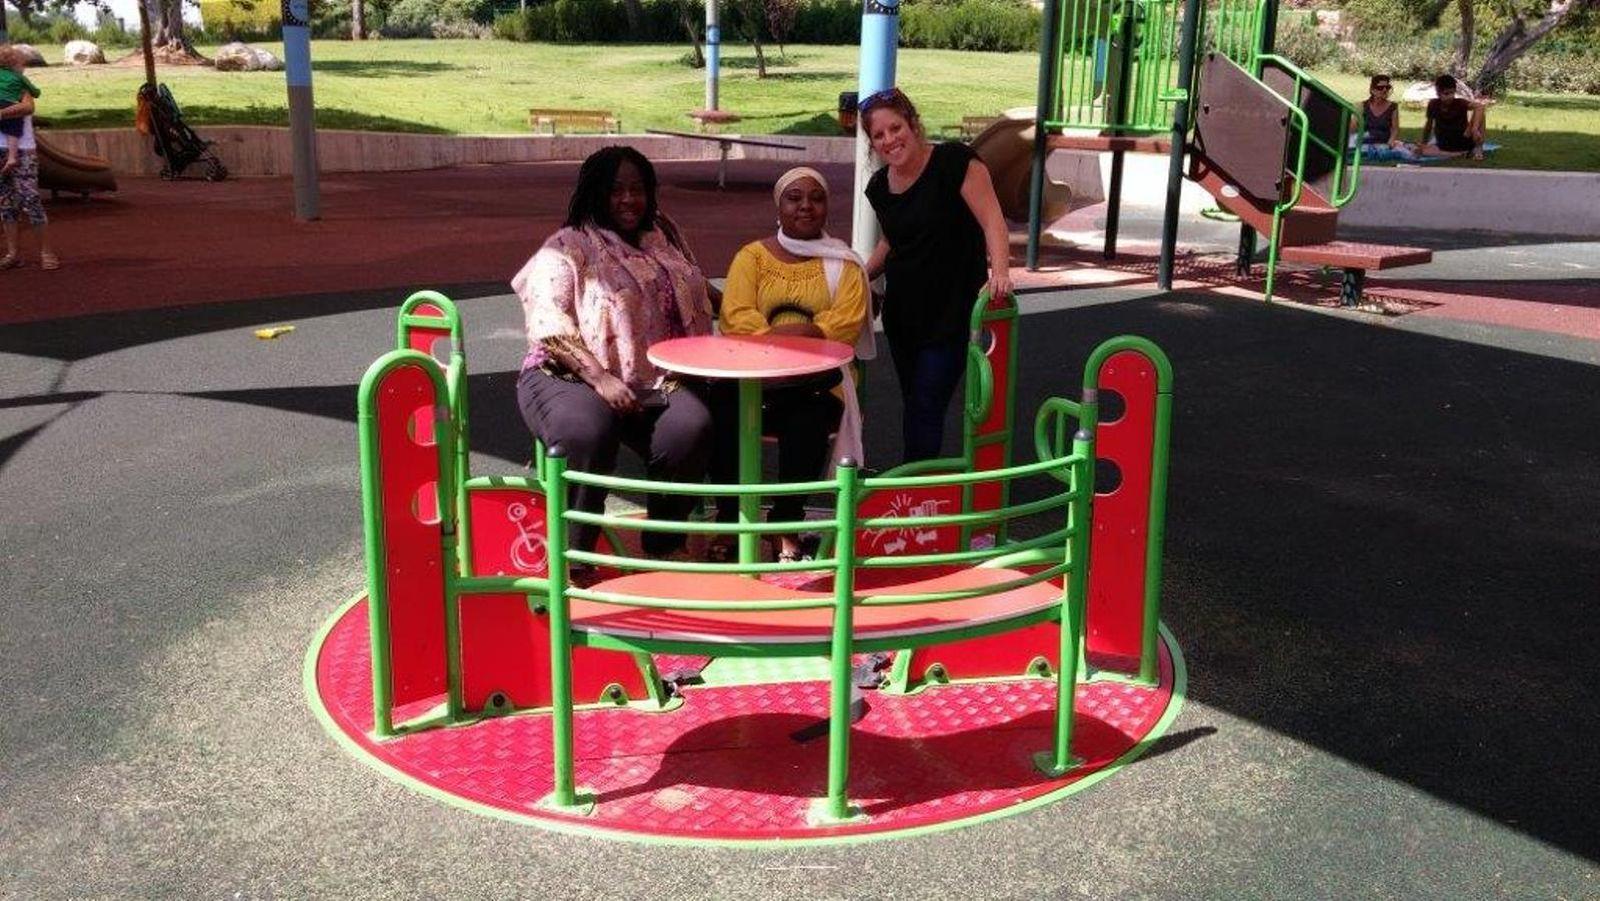 Osuntusa, Askayo and Abdul Kadir in Friendship Park. Photo courtesy of Beit Issie Shapiro